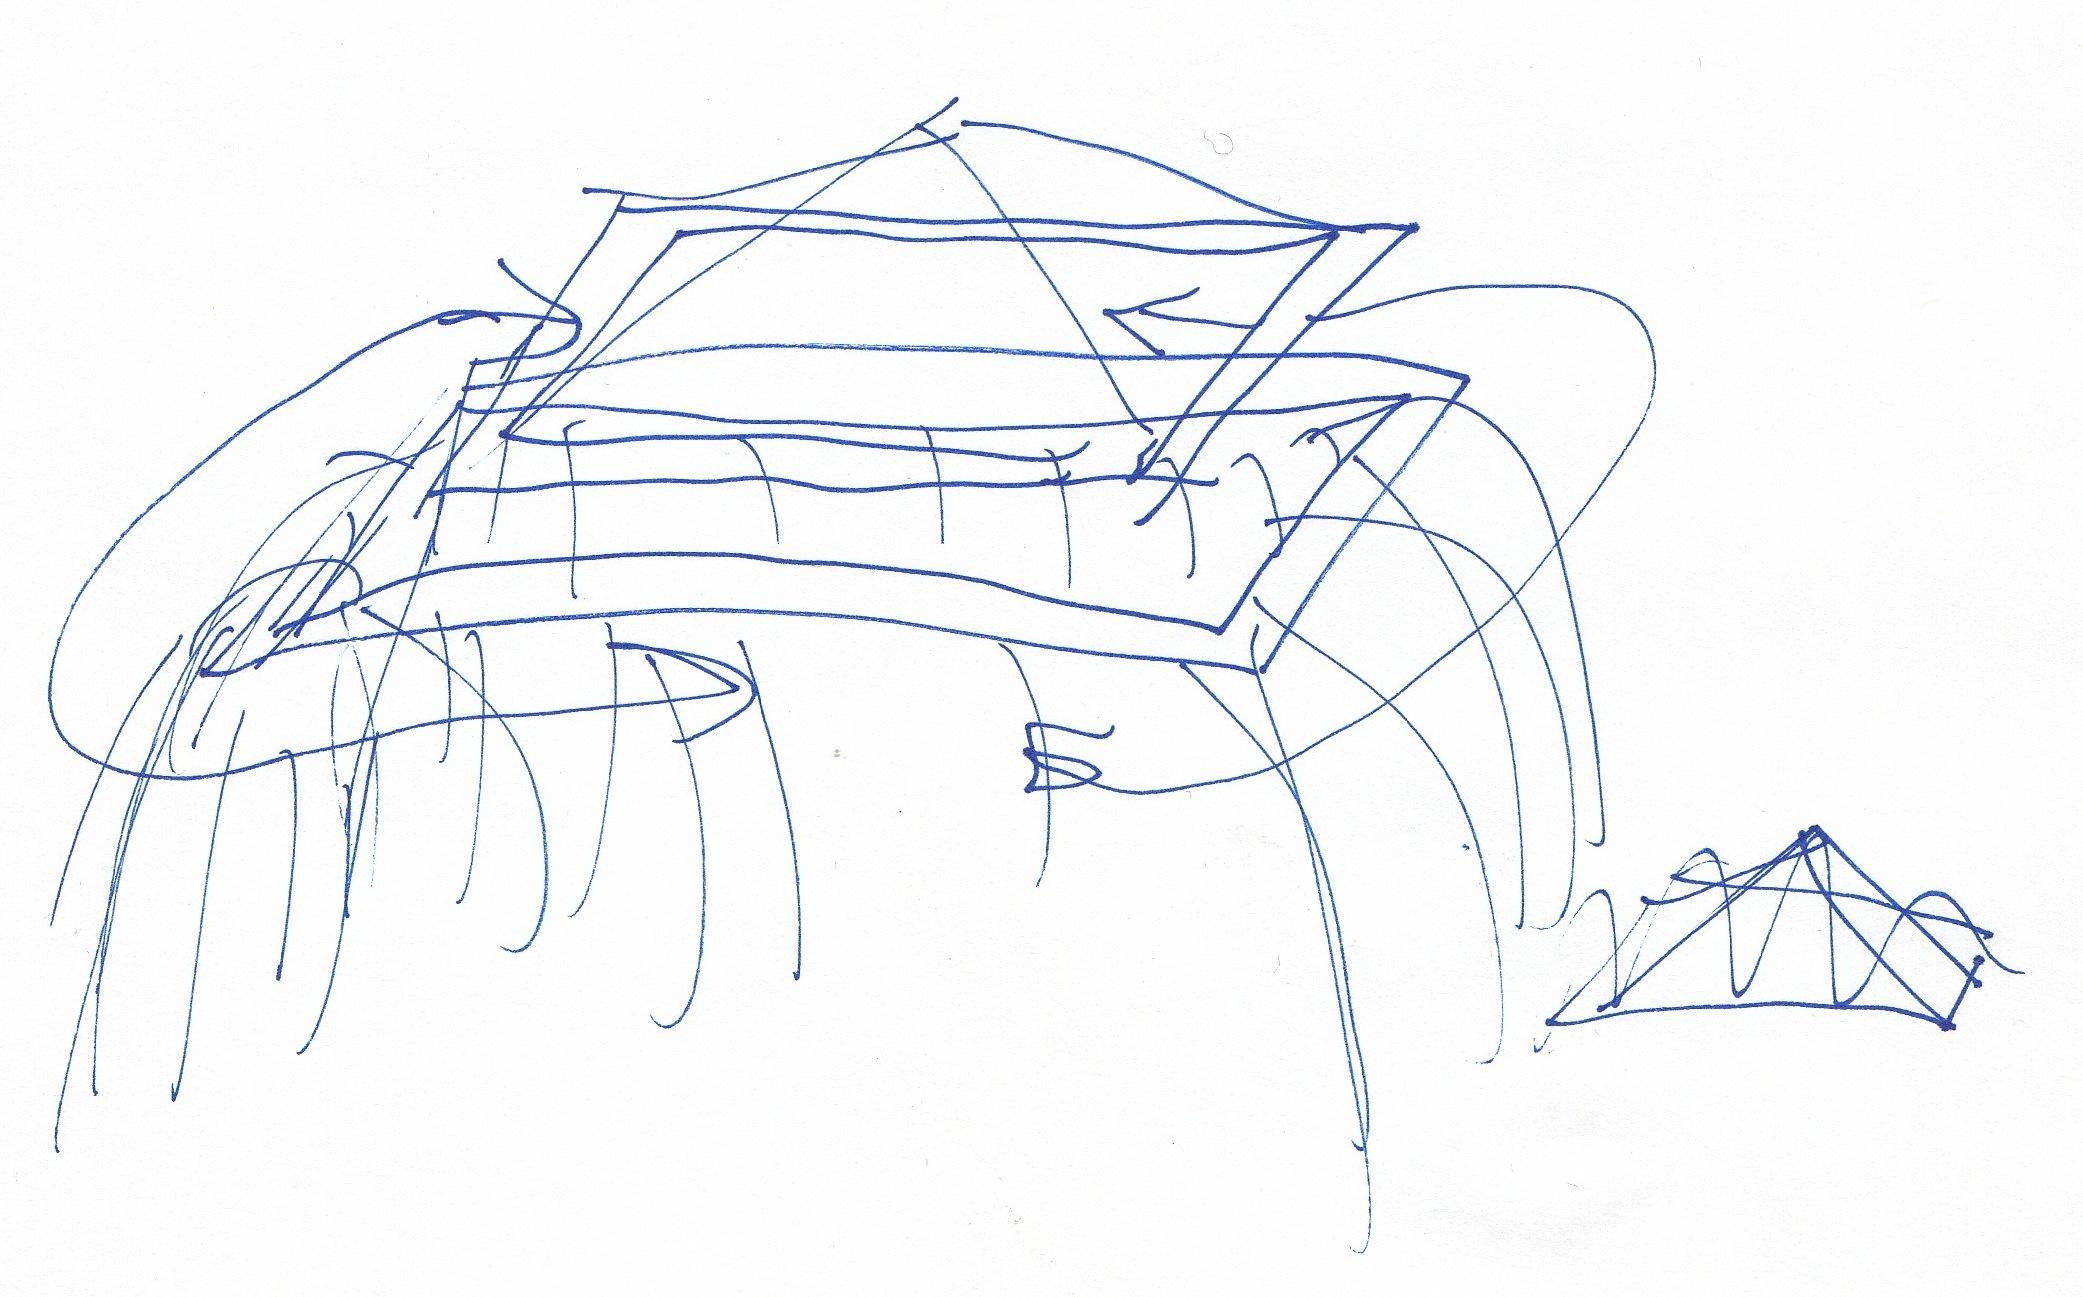 epic-blanket-fort-diagram2.jpg